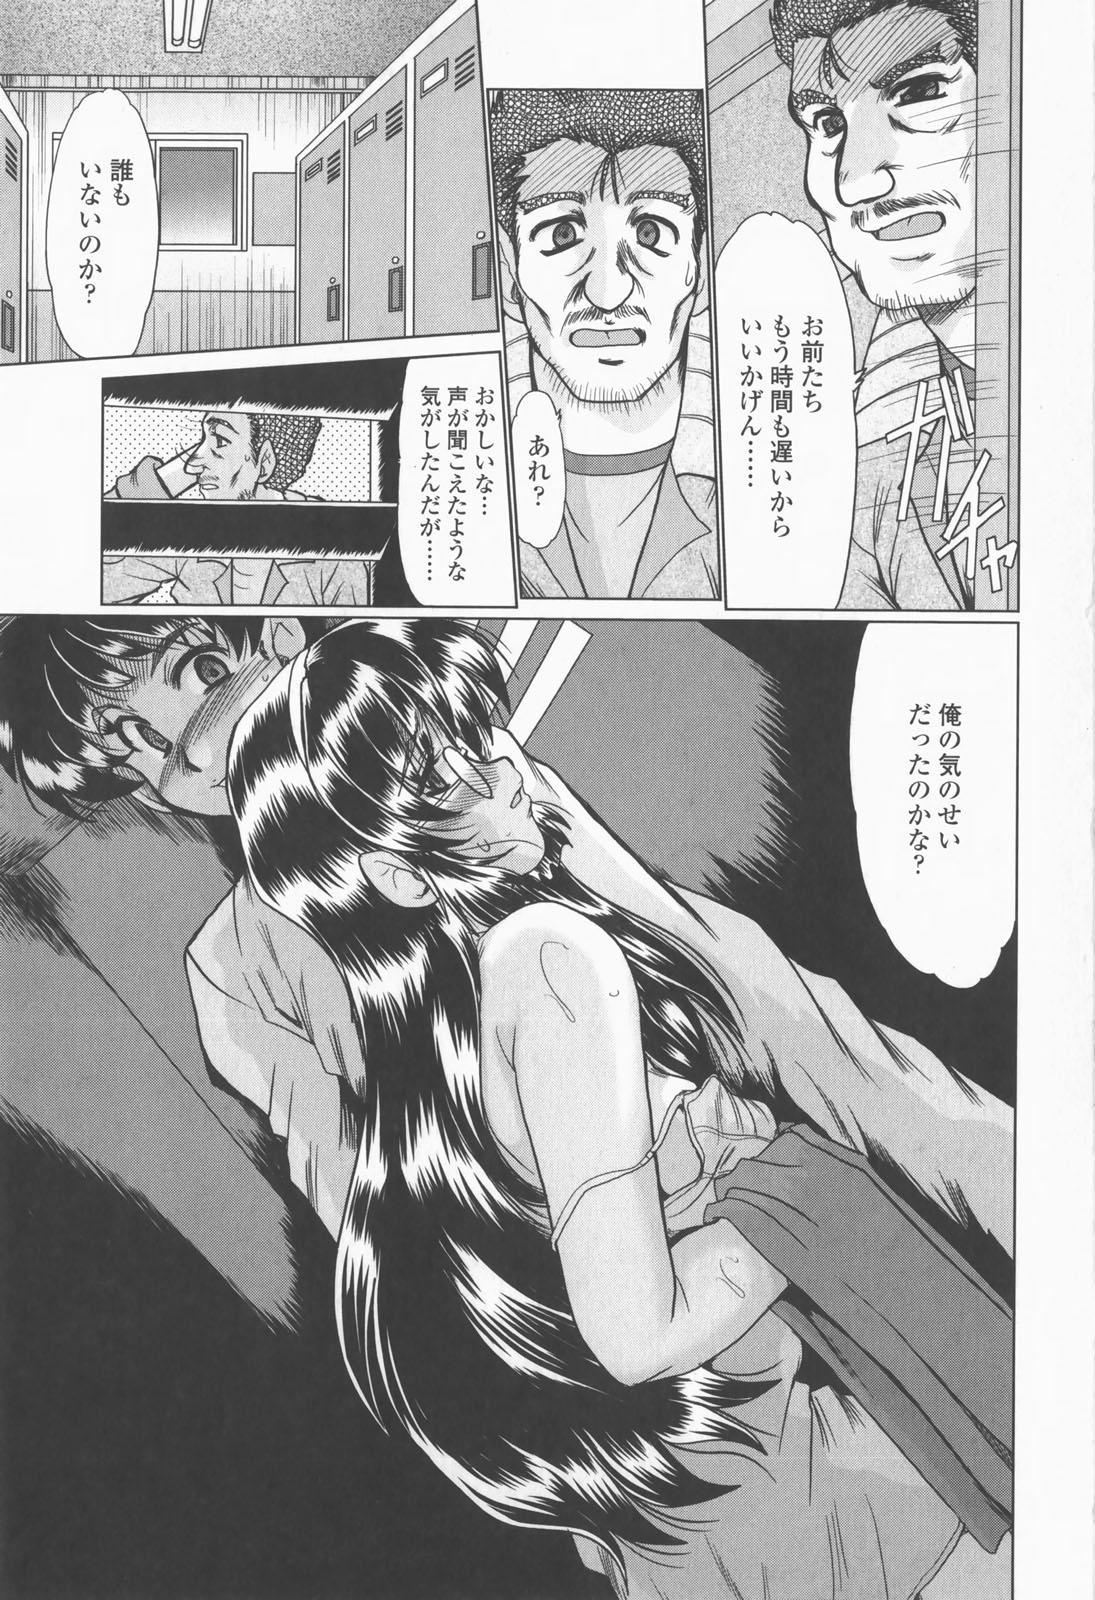 Inran Okusama Gari - Lewd Wife Hunting 68